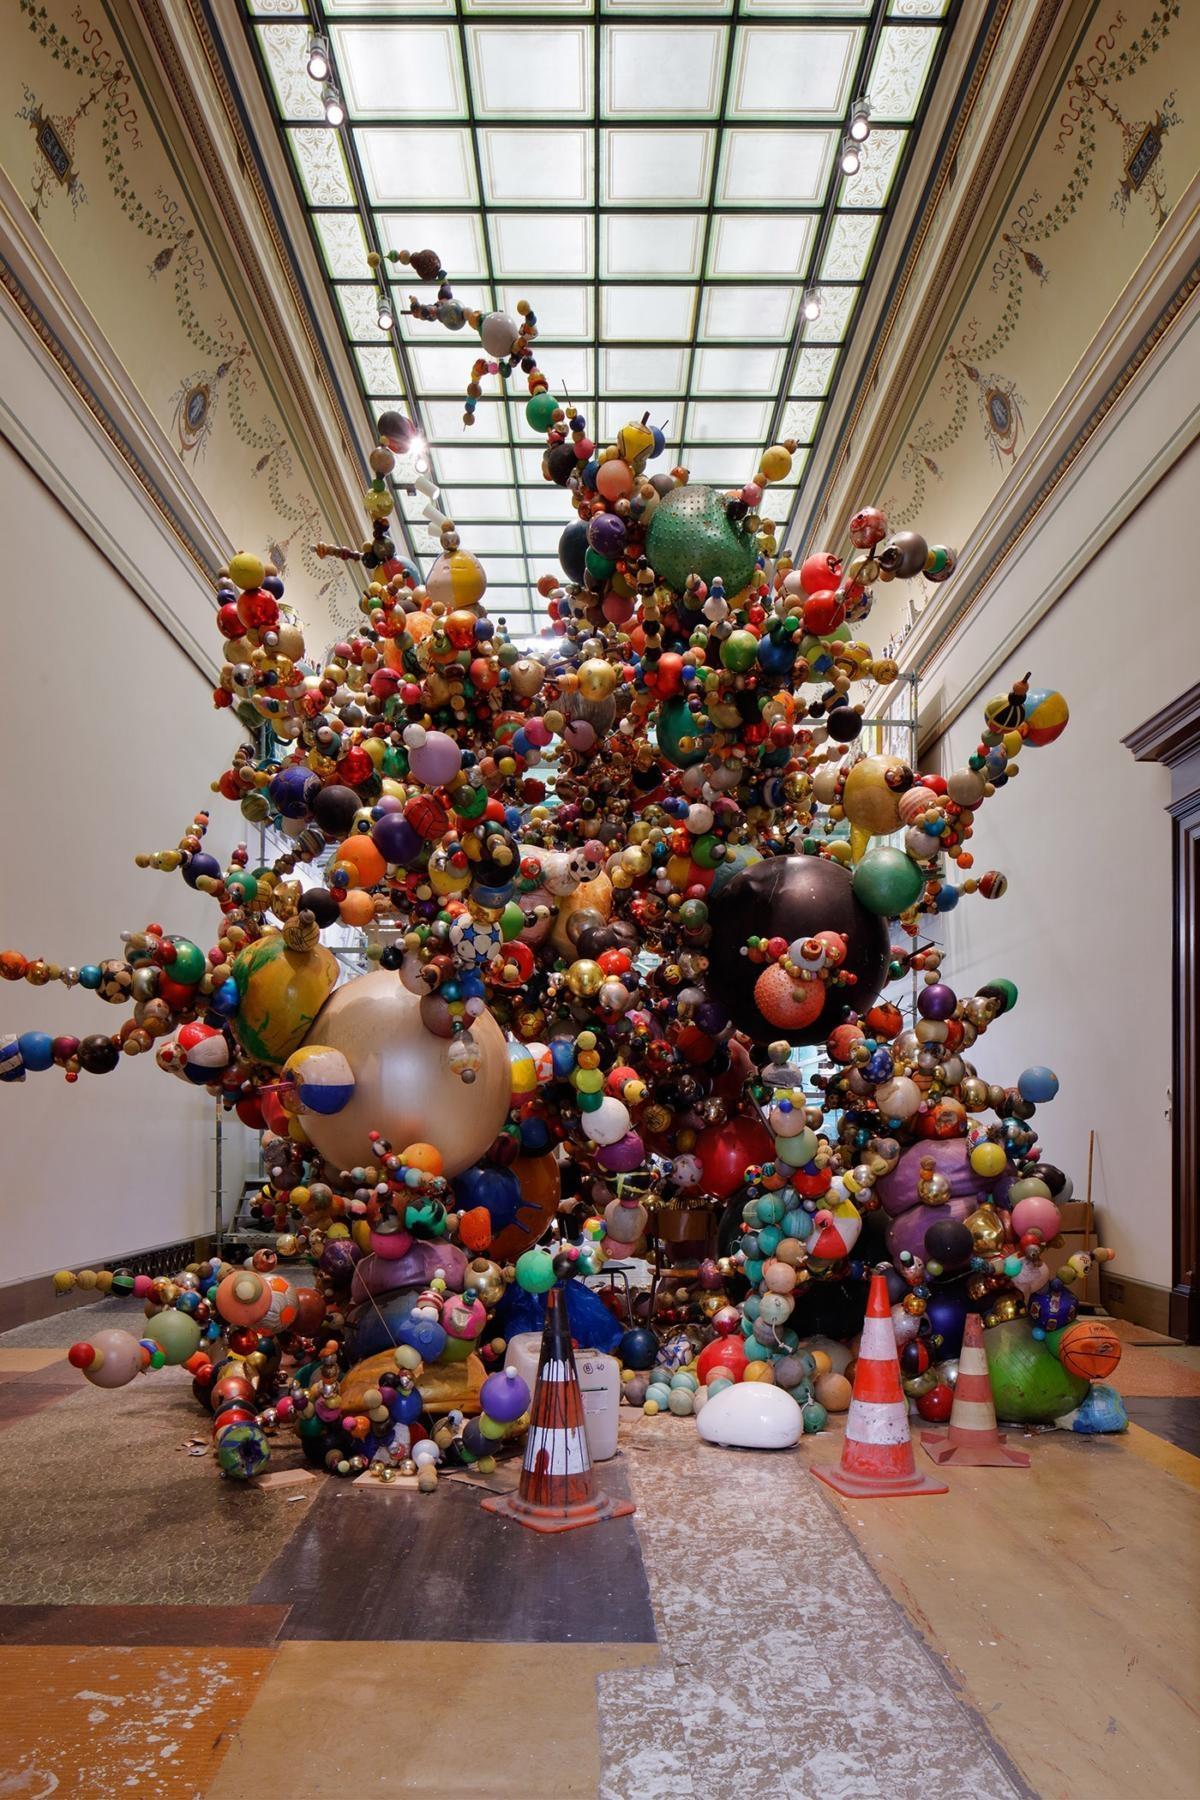 'Nervous Trees' by Krištof Kintera at the Galerie Rudolfinum